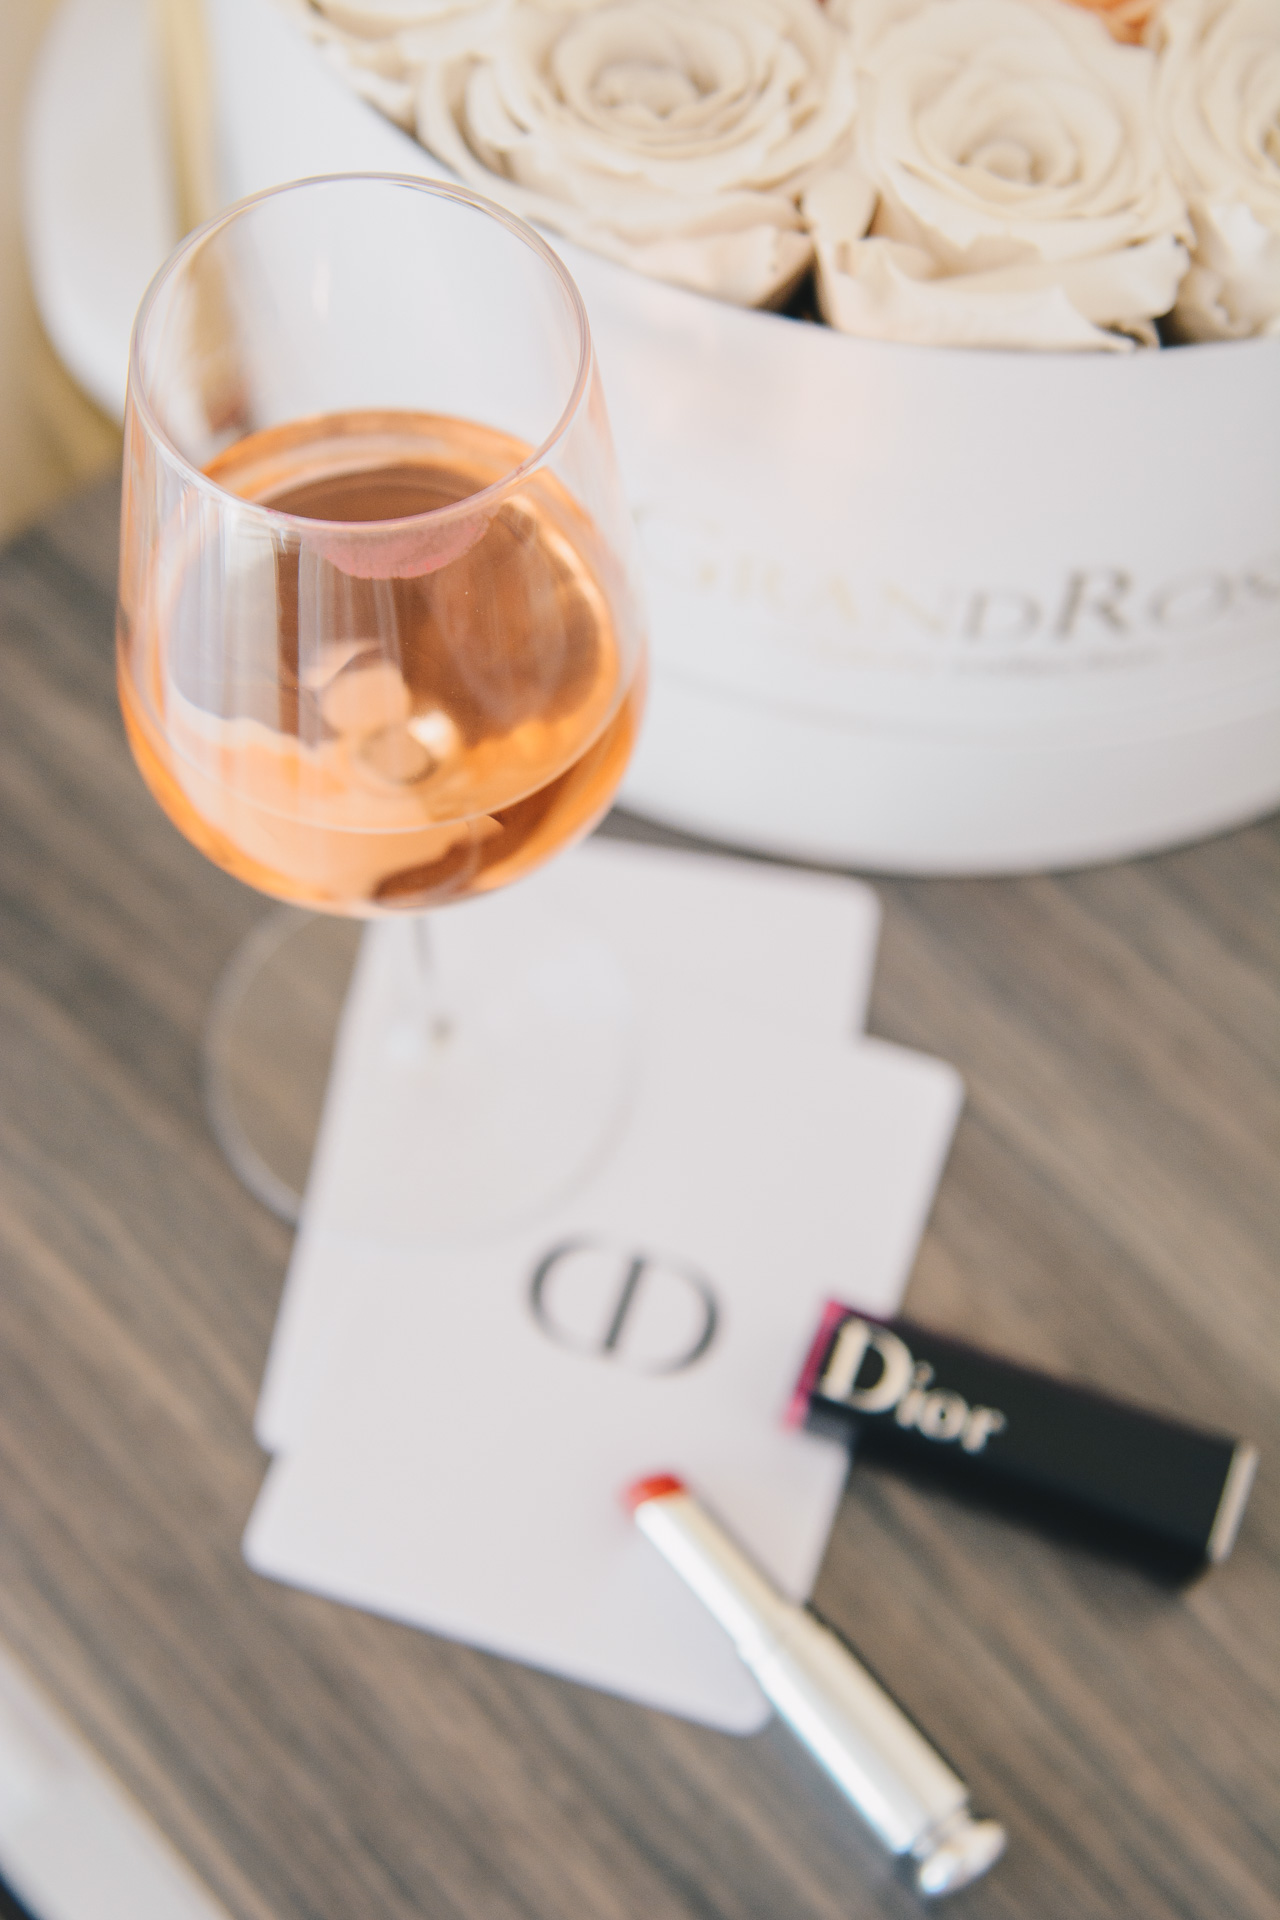 Dior Beauty Lipstick Fuschia